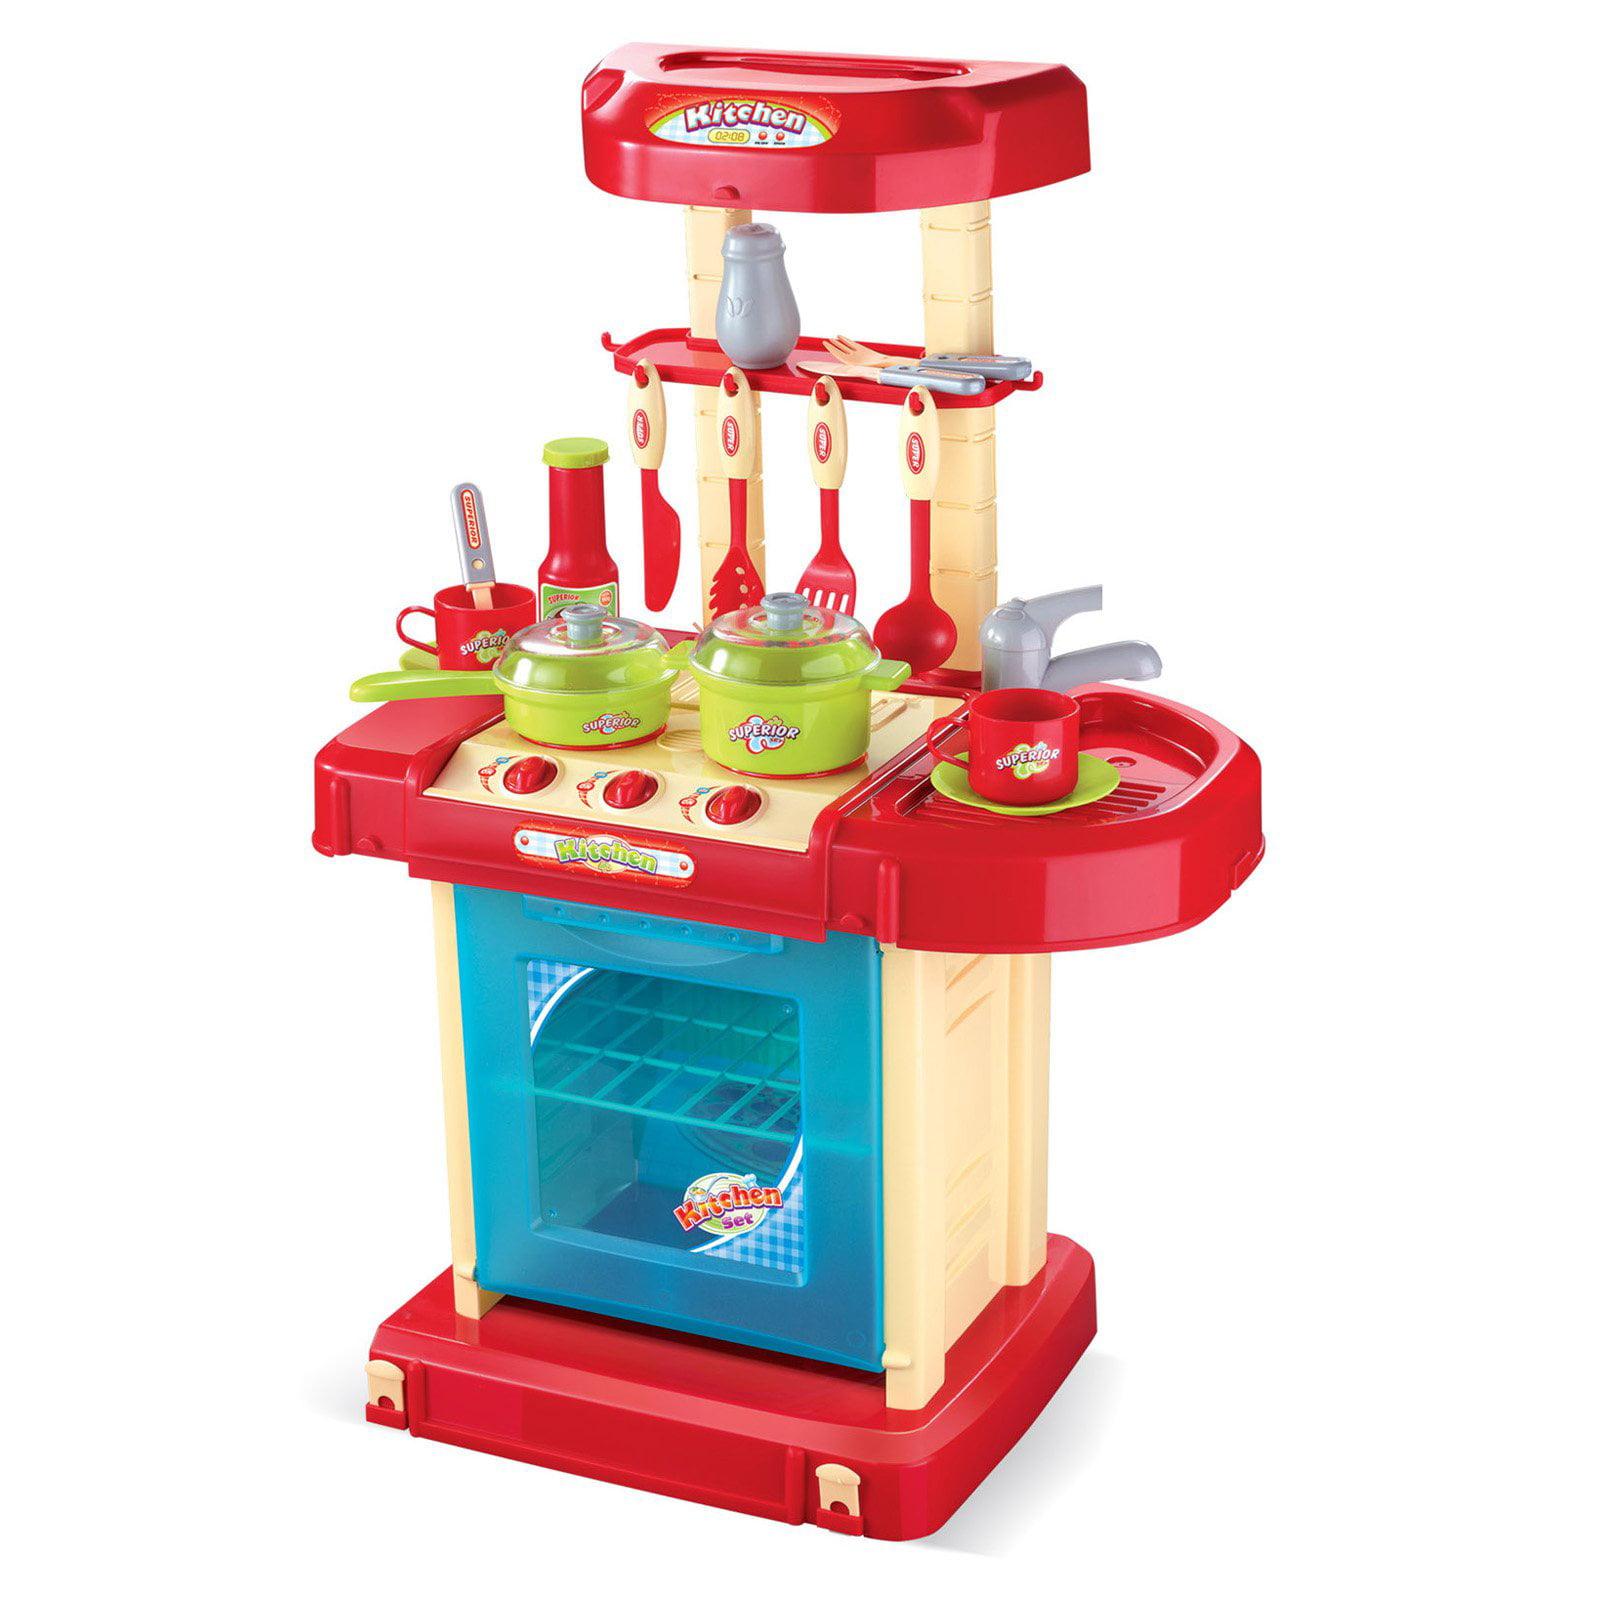 Red Play Kitchen Set red play kitchen set - home design ideas - murphysblackbartplayers